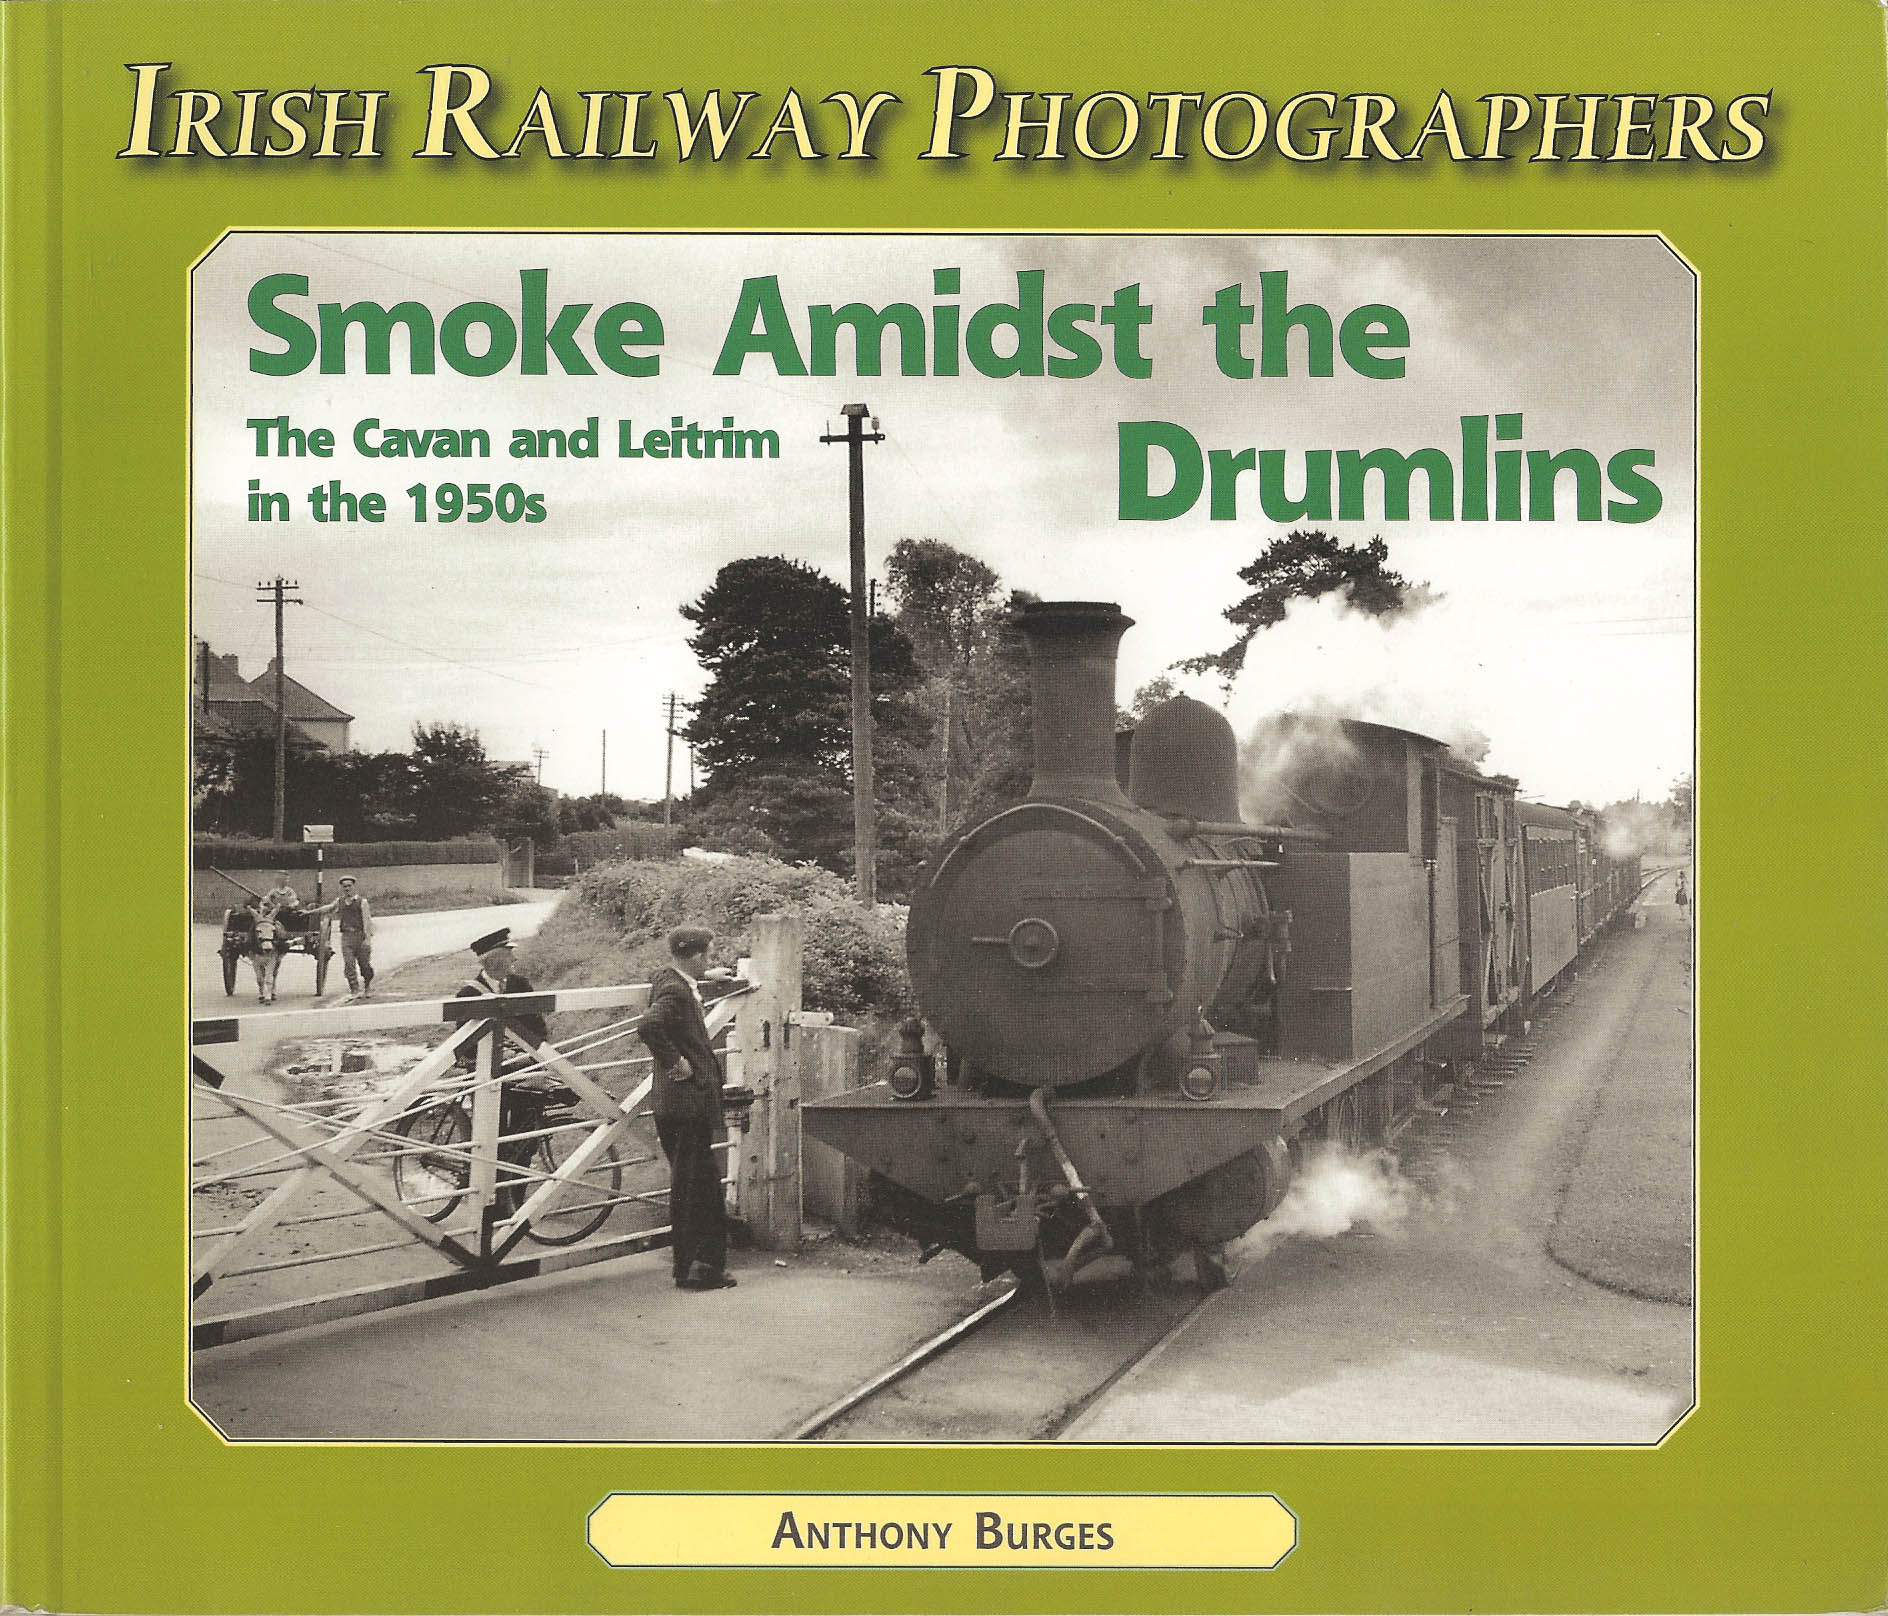 Irish Railway Photographers Smoke Amidst the Drumlins